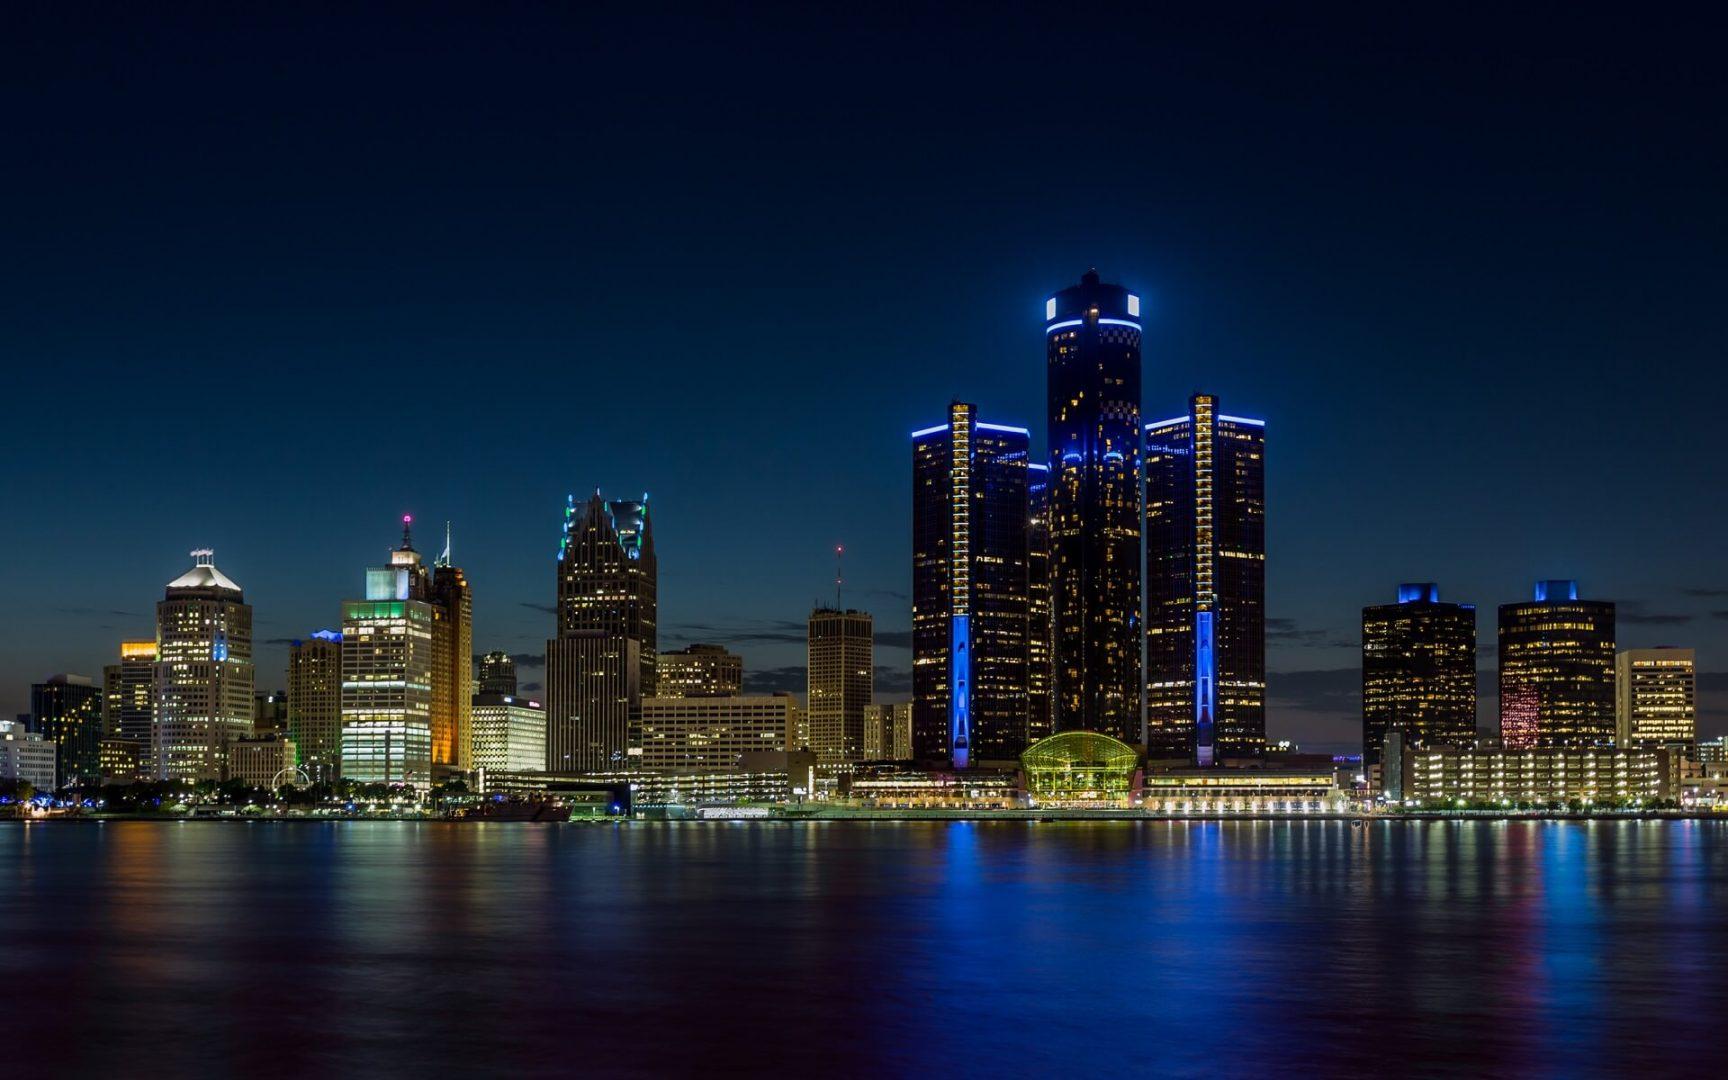 Detroit City Header Image